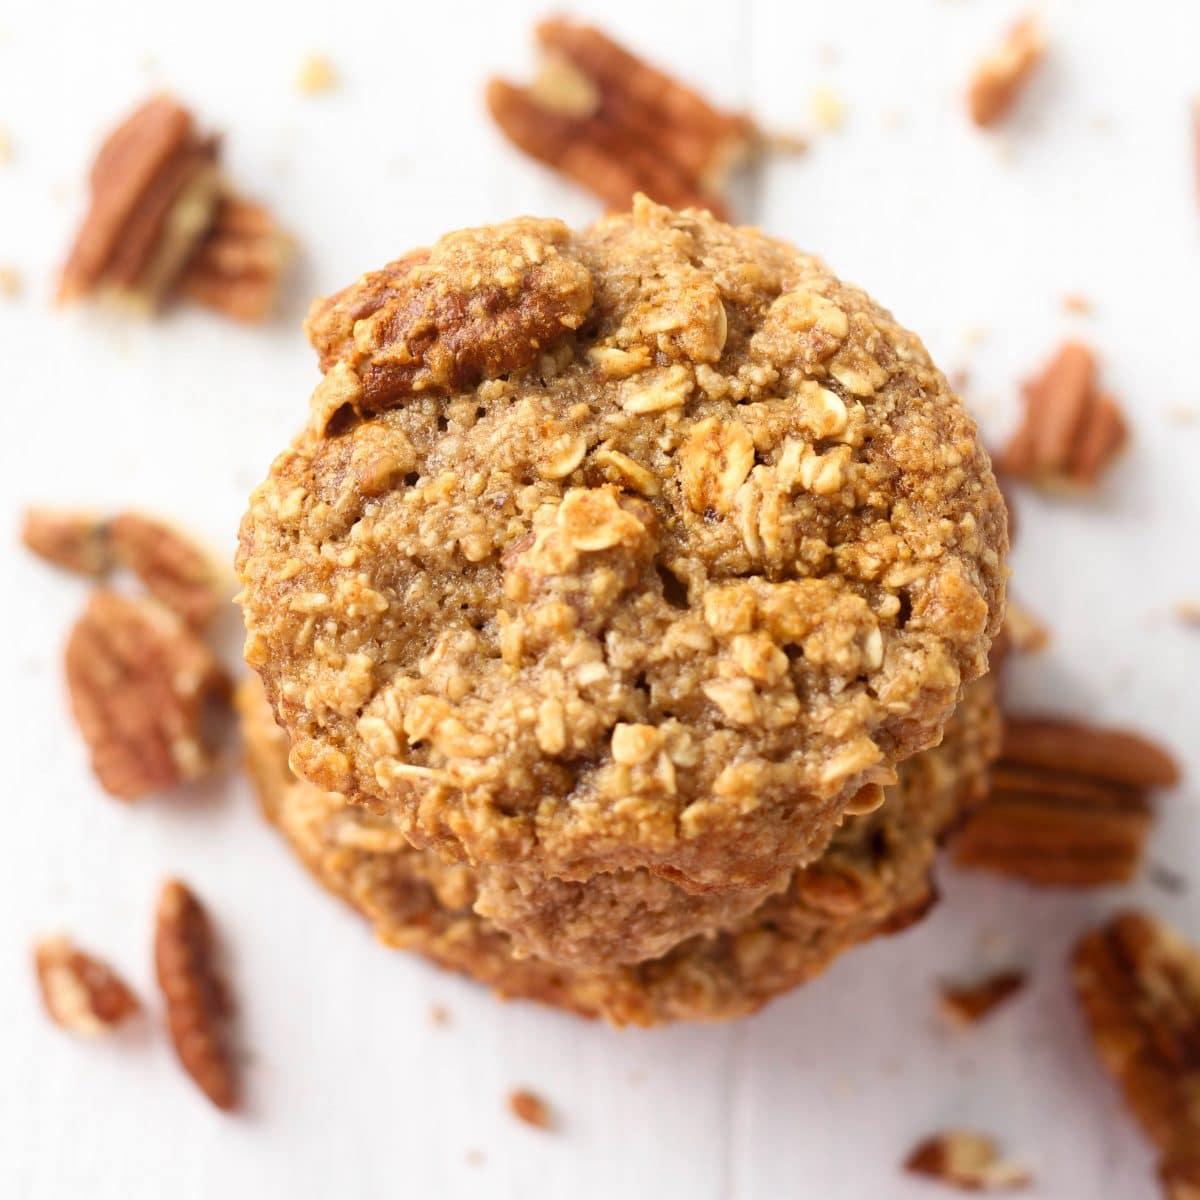 Healthy Oatmeal Pecan Cookies (dairy, Egg, & Gluten Free Cookies)